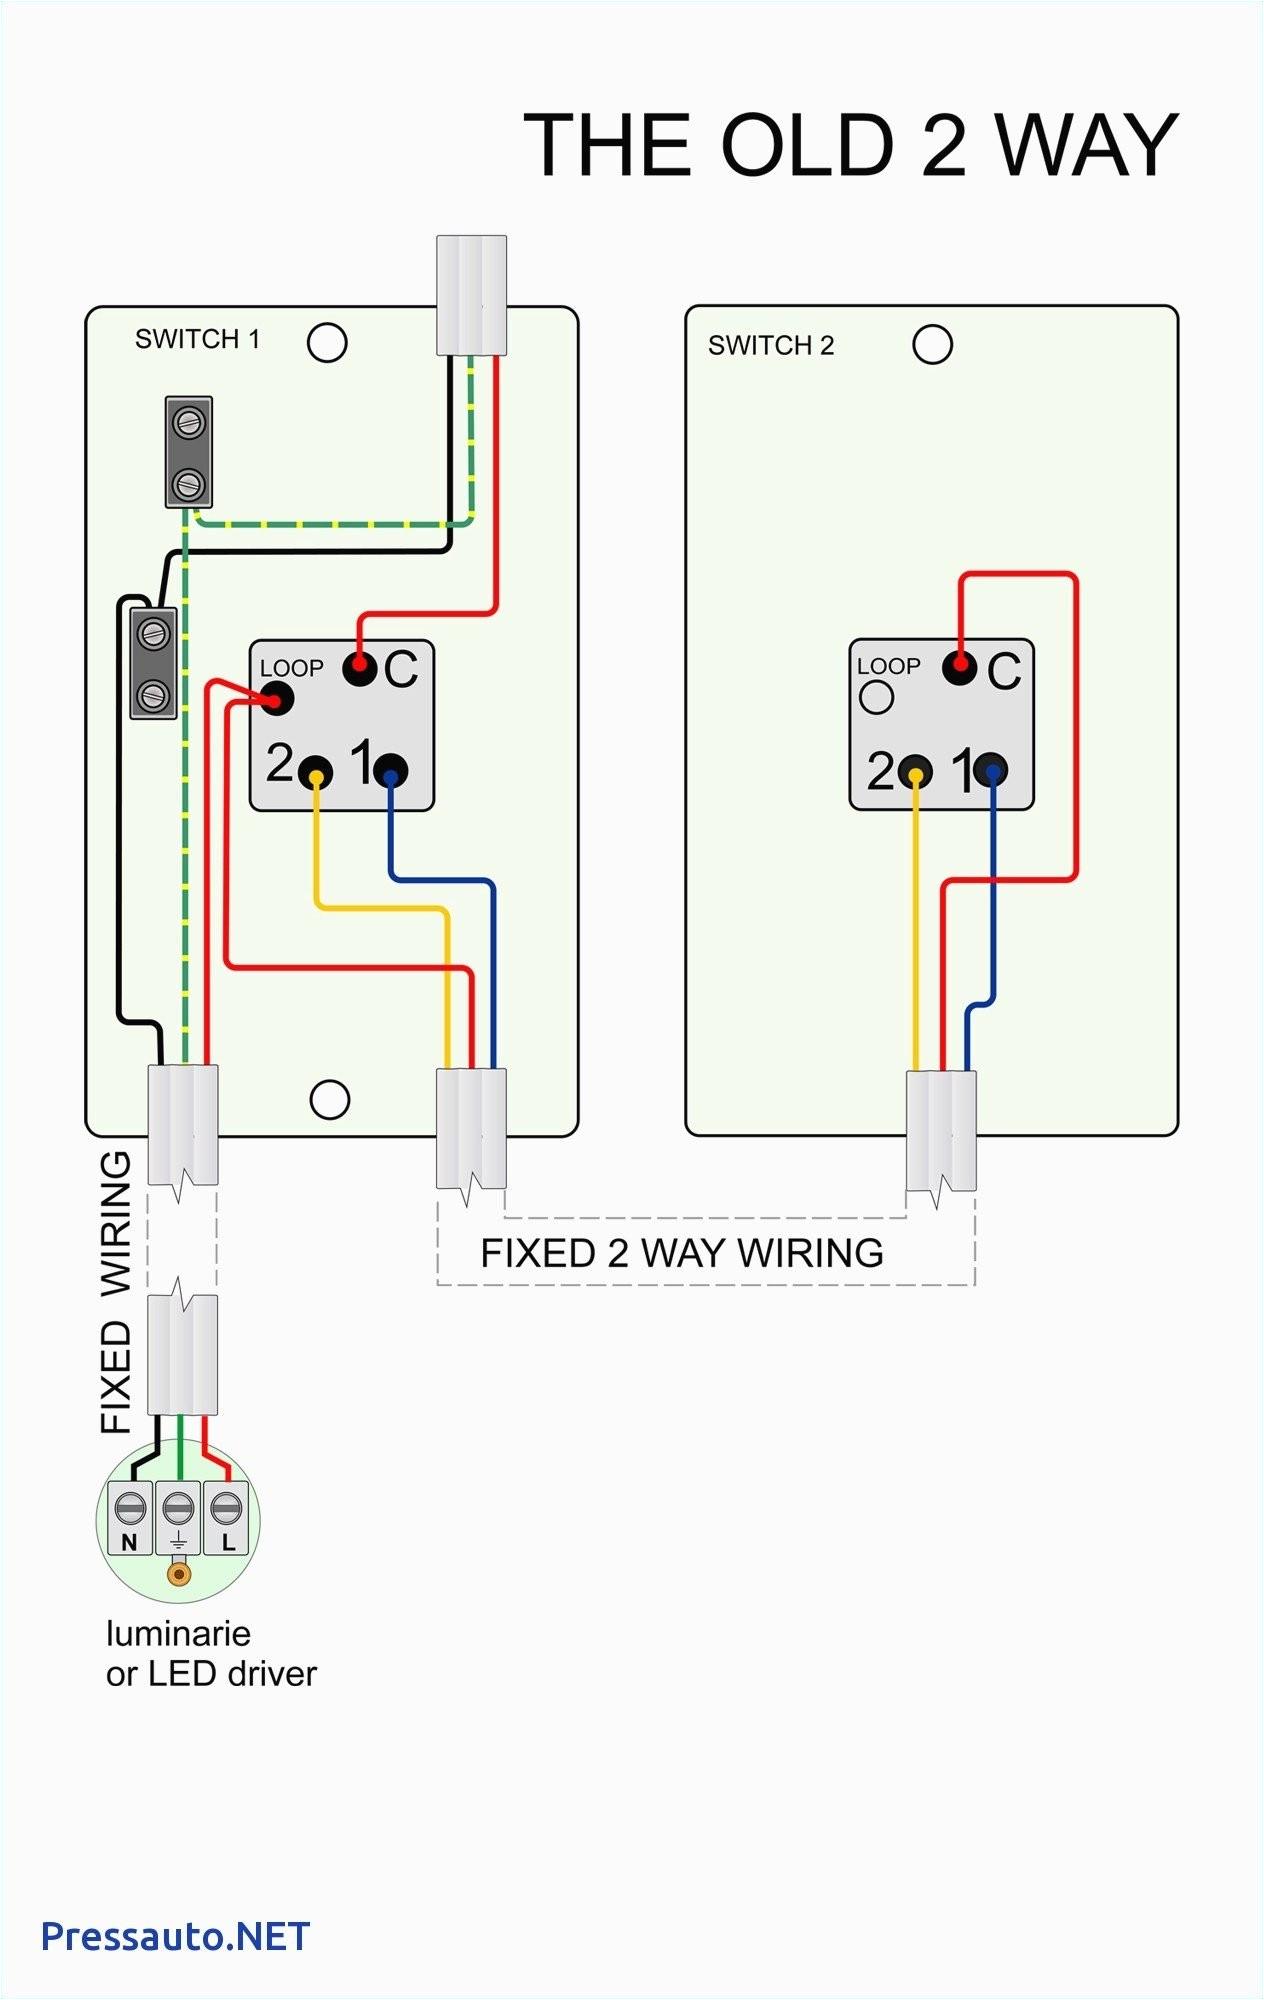 2 way switch diagram light loopback wiring wiring diagrams konsult2 way switch diagram light loopback wiring